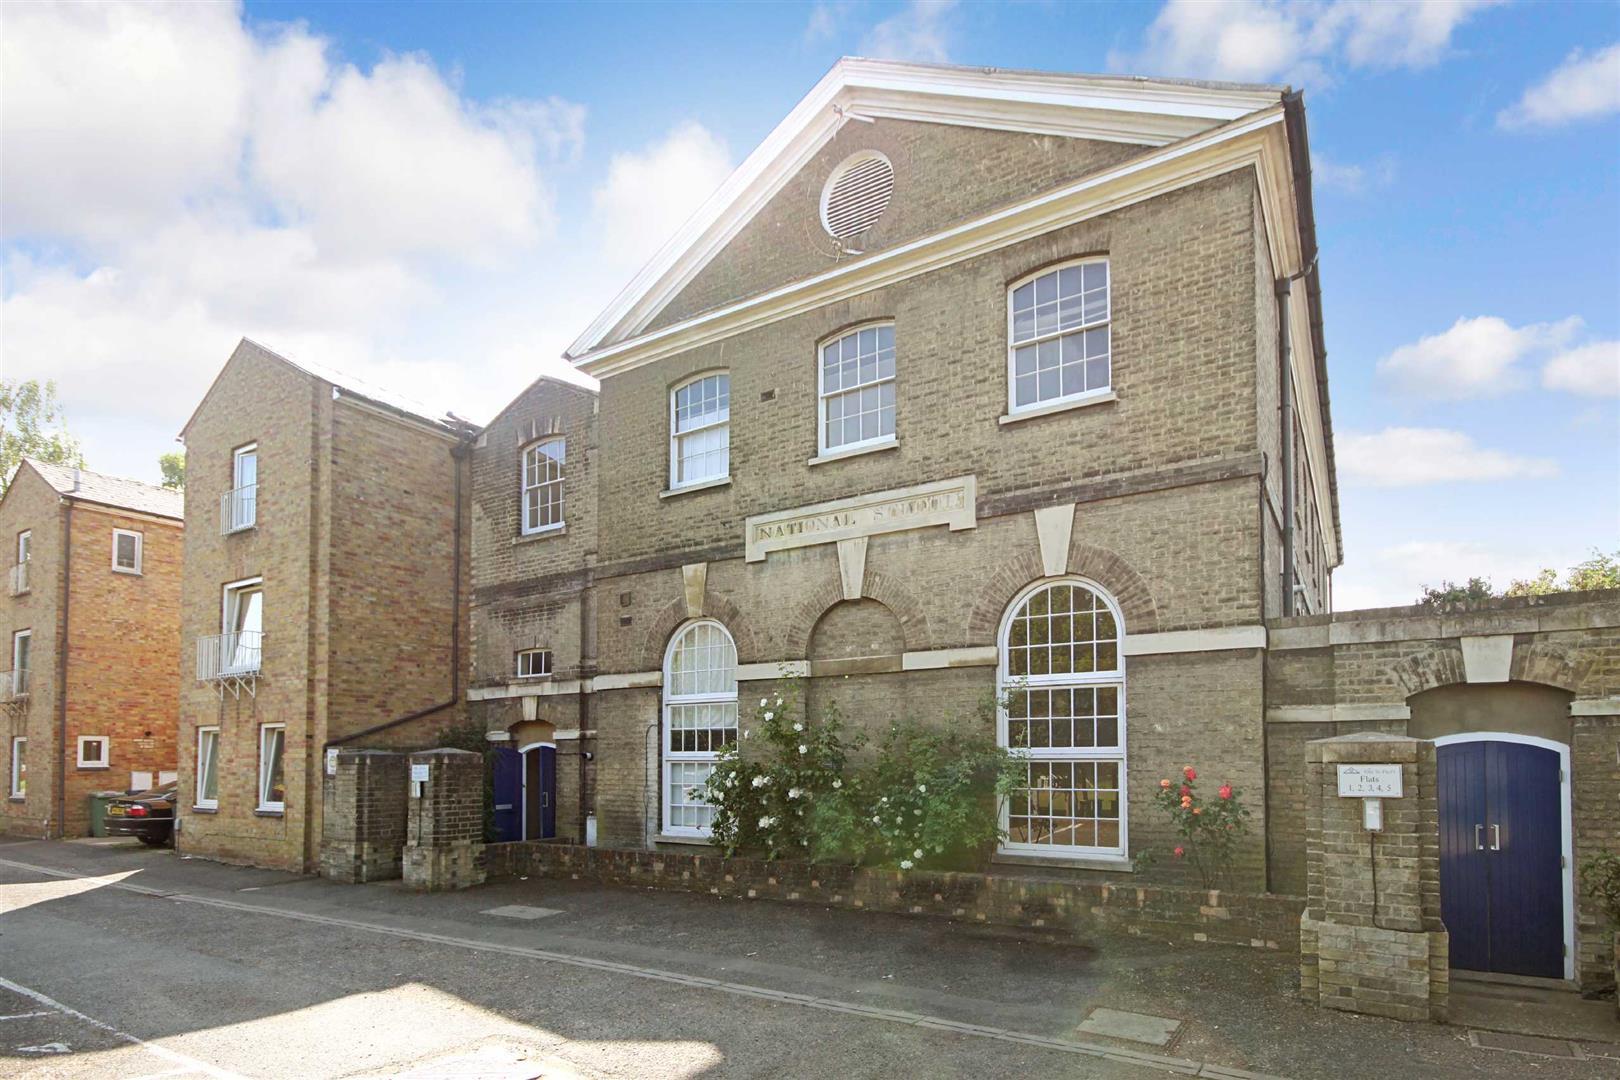 Old St Paul's, Russell Street, Cambridge, Cambridge